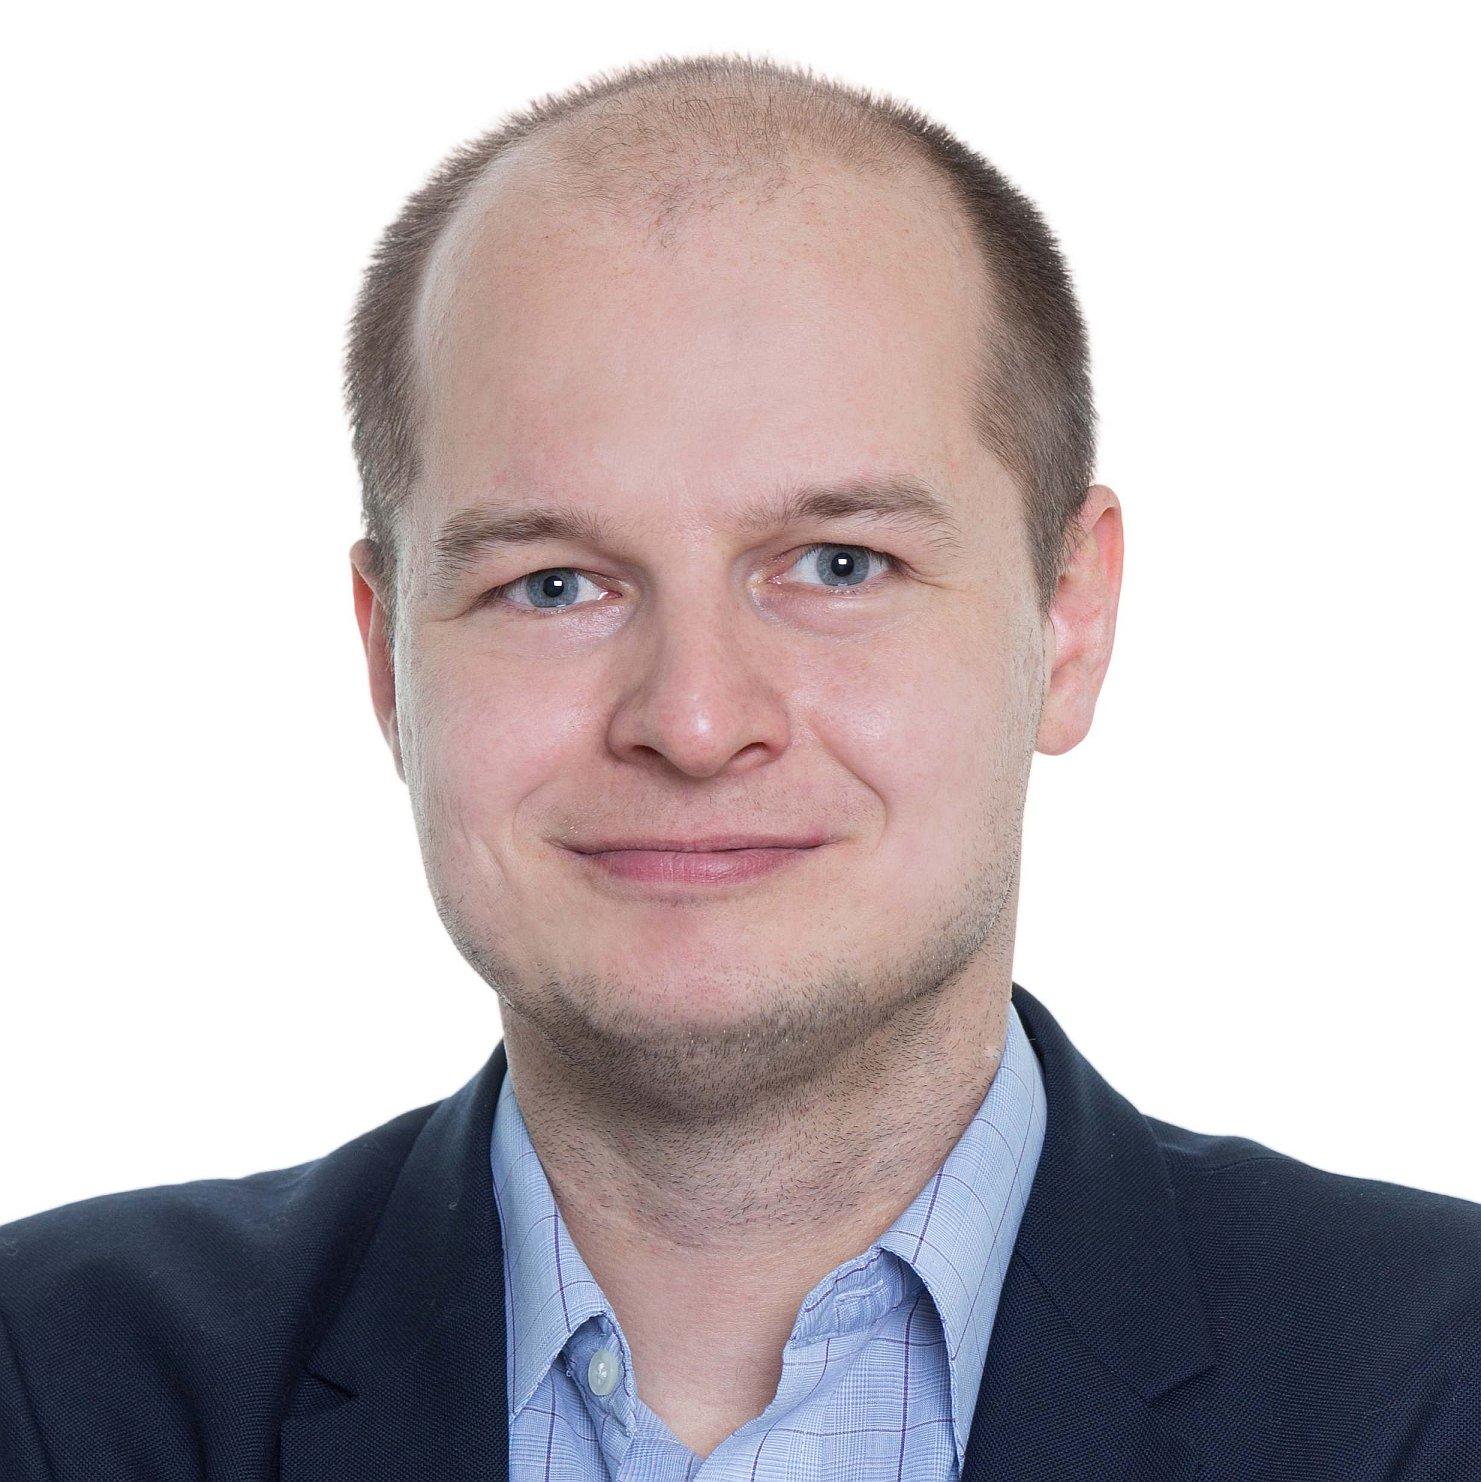 Photo of Petr Pařízek, Director Corporate Communications at PR.Konektor